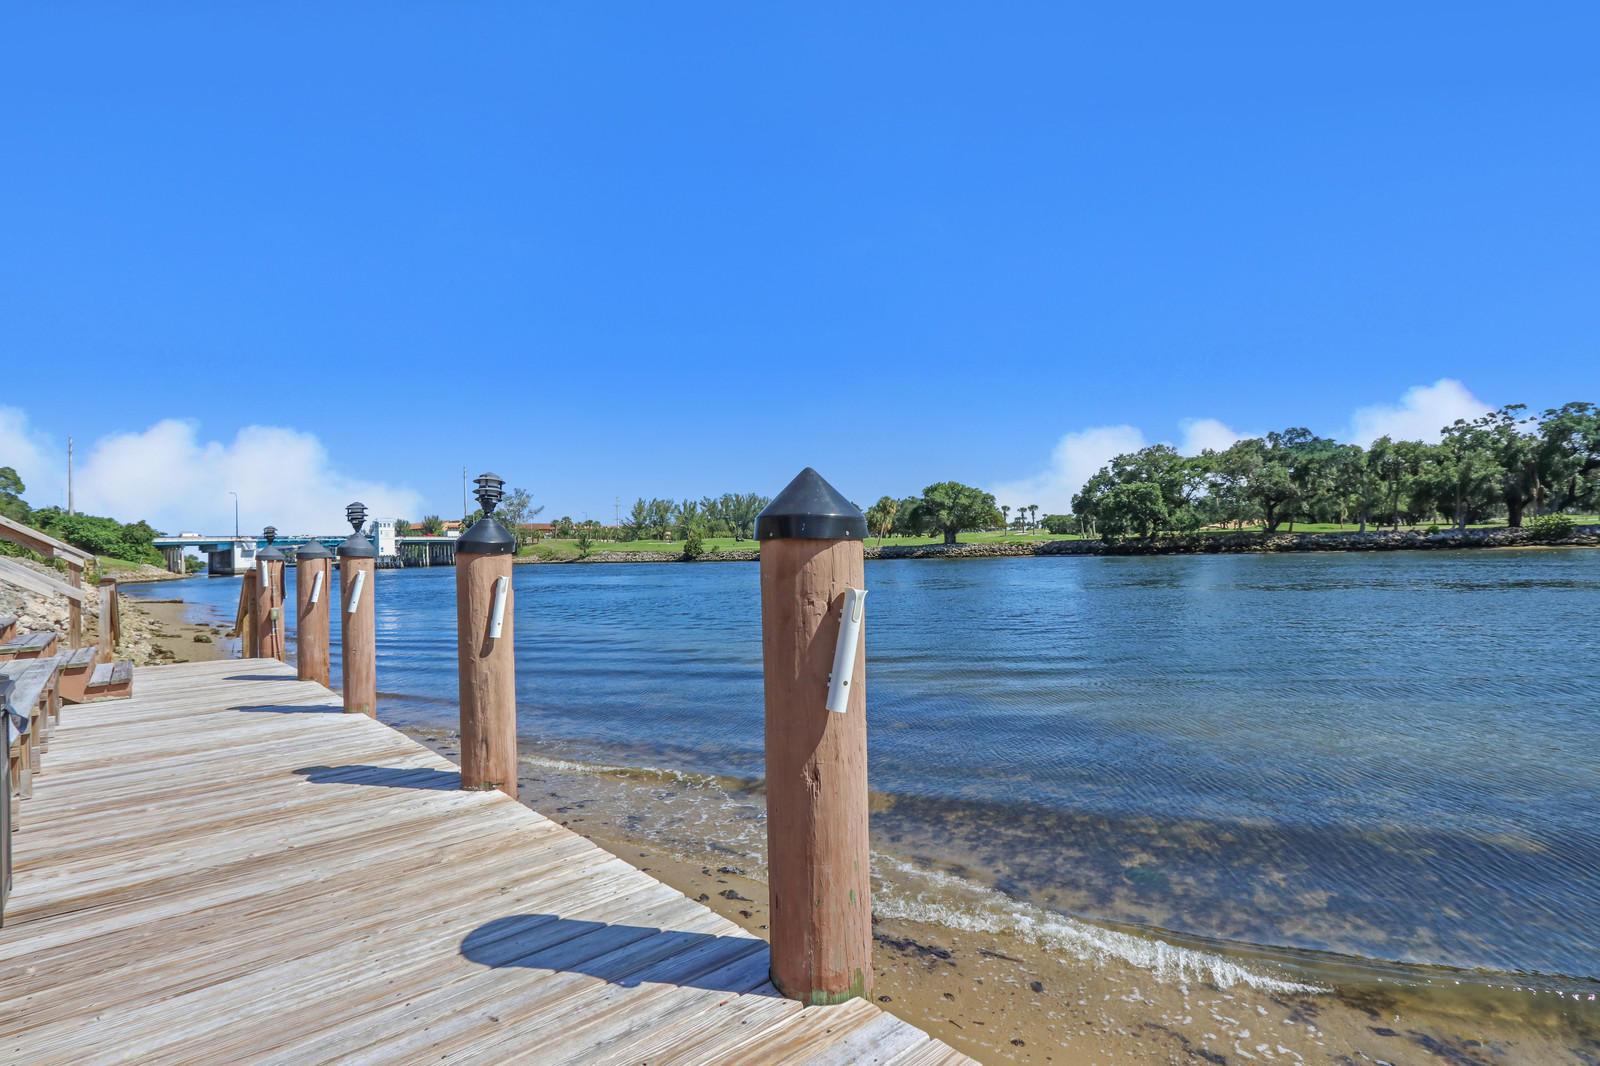 GEMINI NORTH PALM BEACH FLORIDA